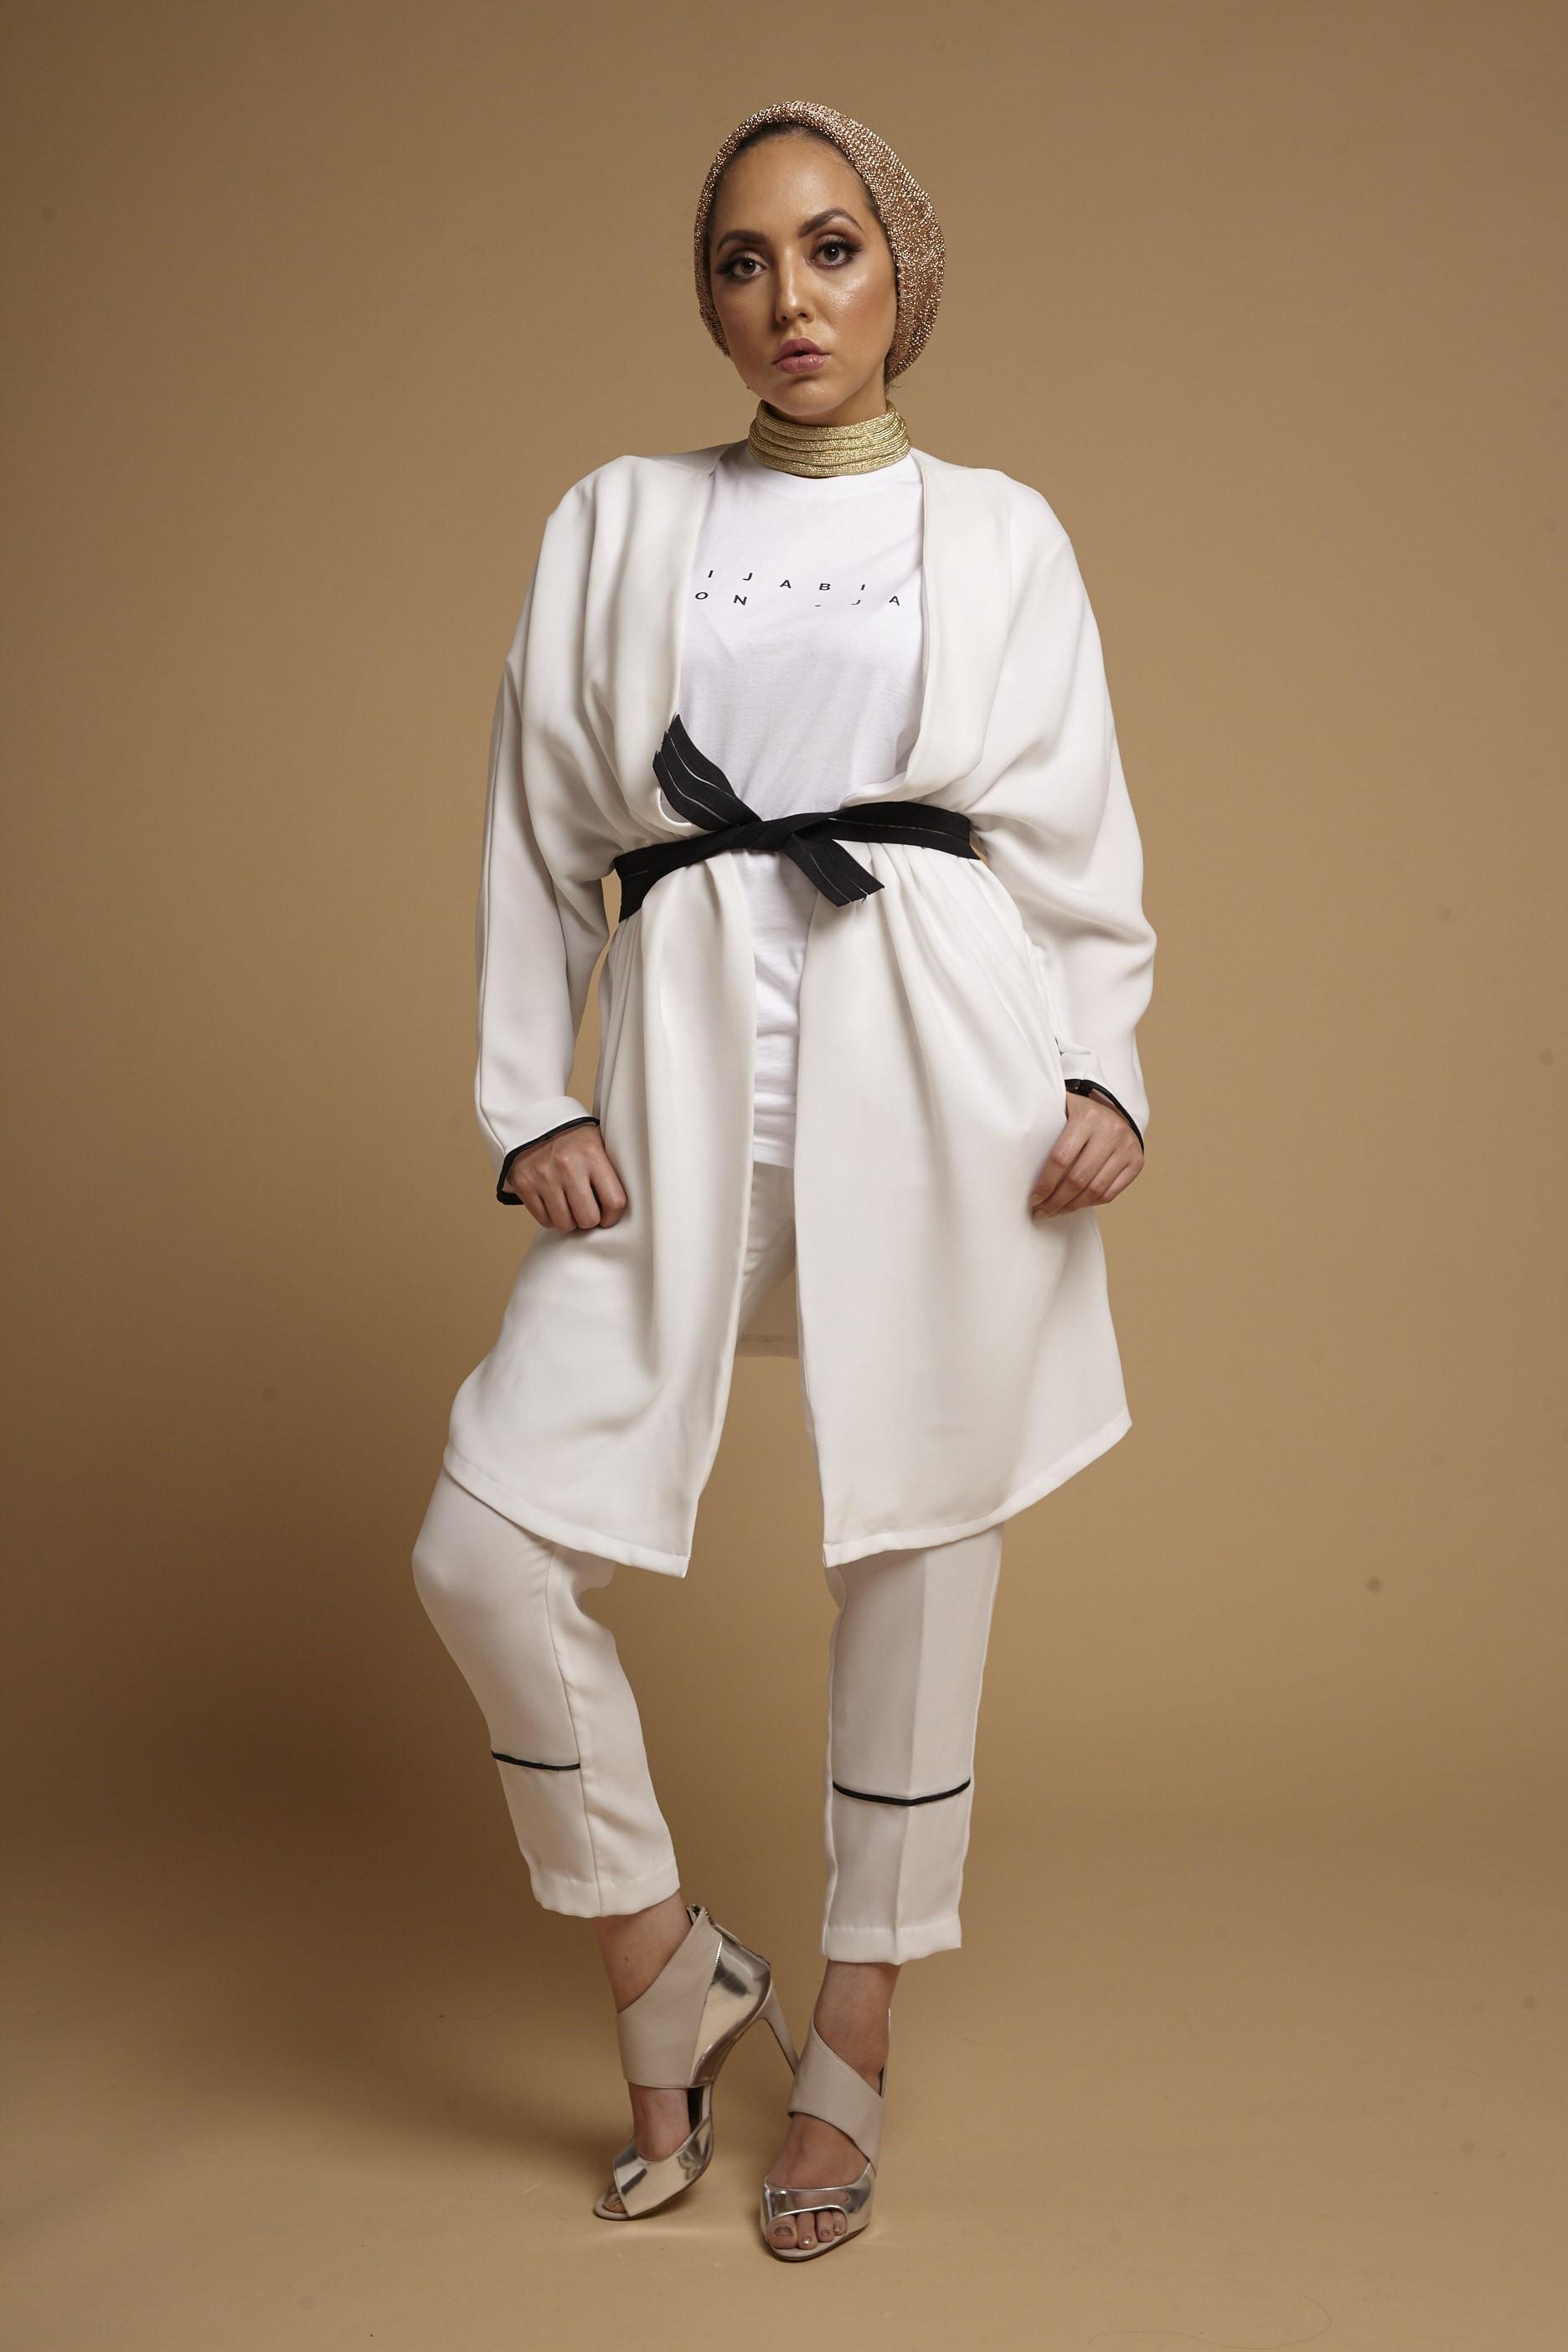 Uae Based Fashion Designers You Should Know